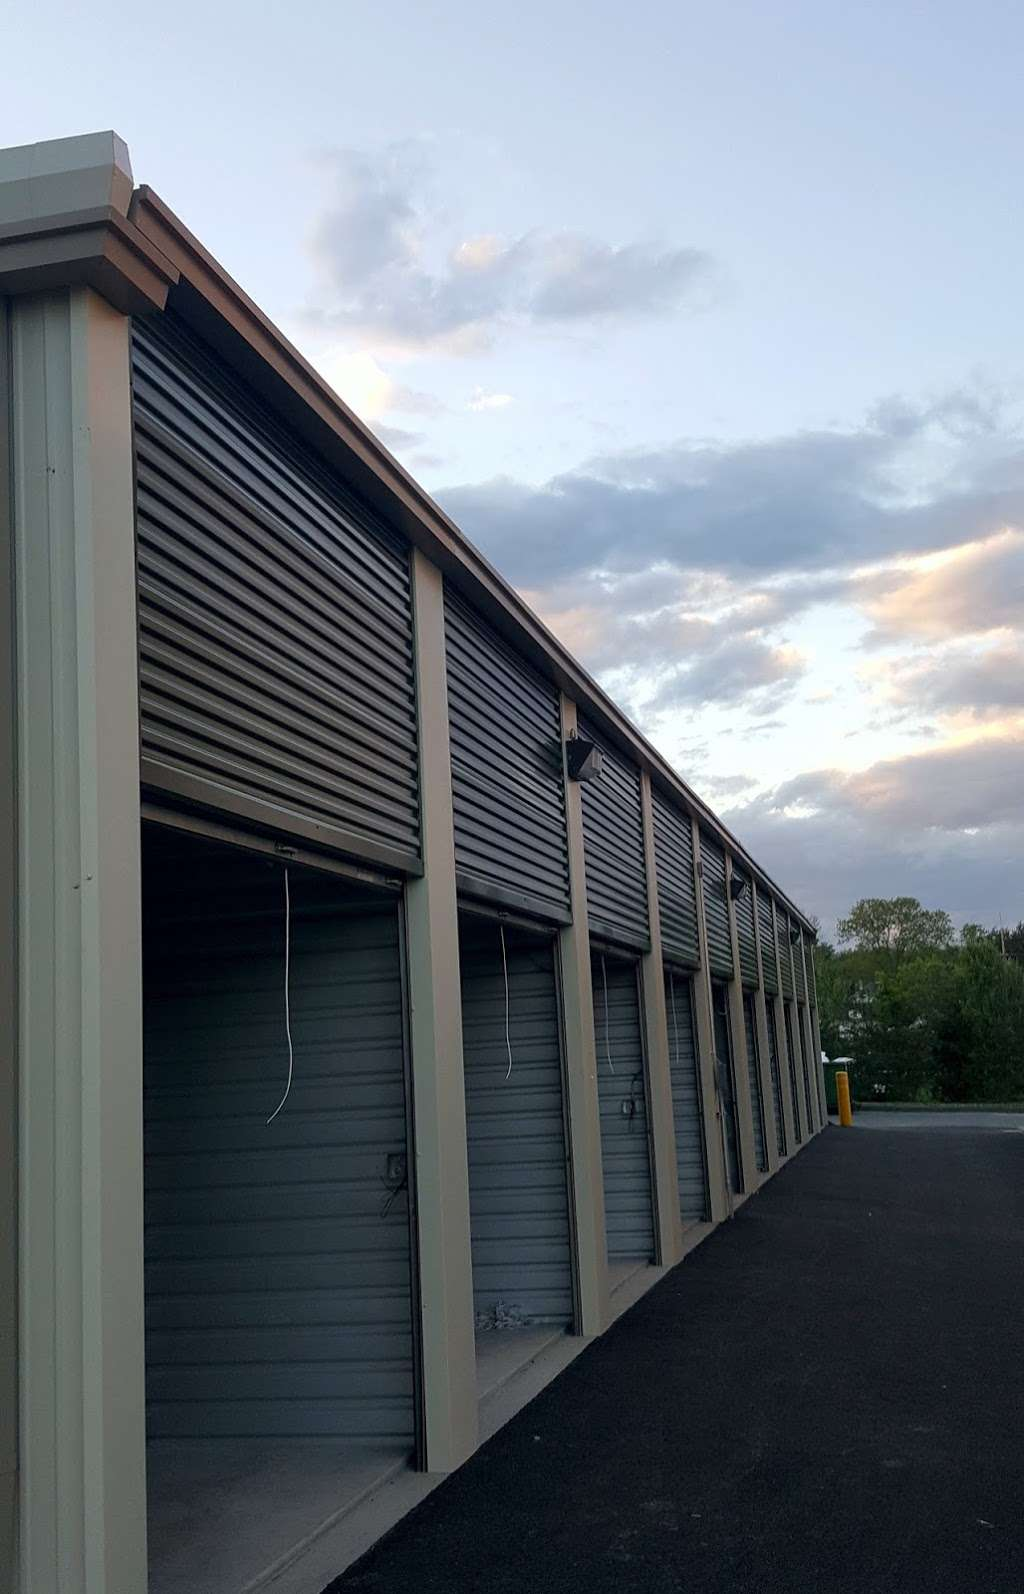 Storage King USA - moving company  | Photo 4 of 10 | Address: 1339 Belcamp Rd, Belcamp, MD 21017, USA | Phone: (410) 272-7272